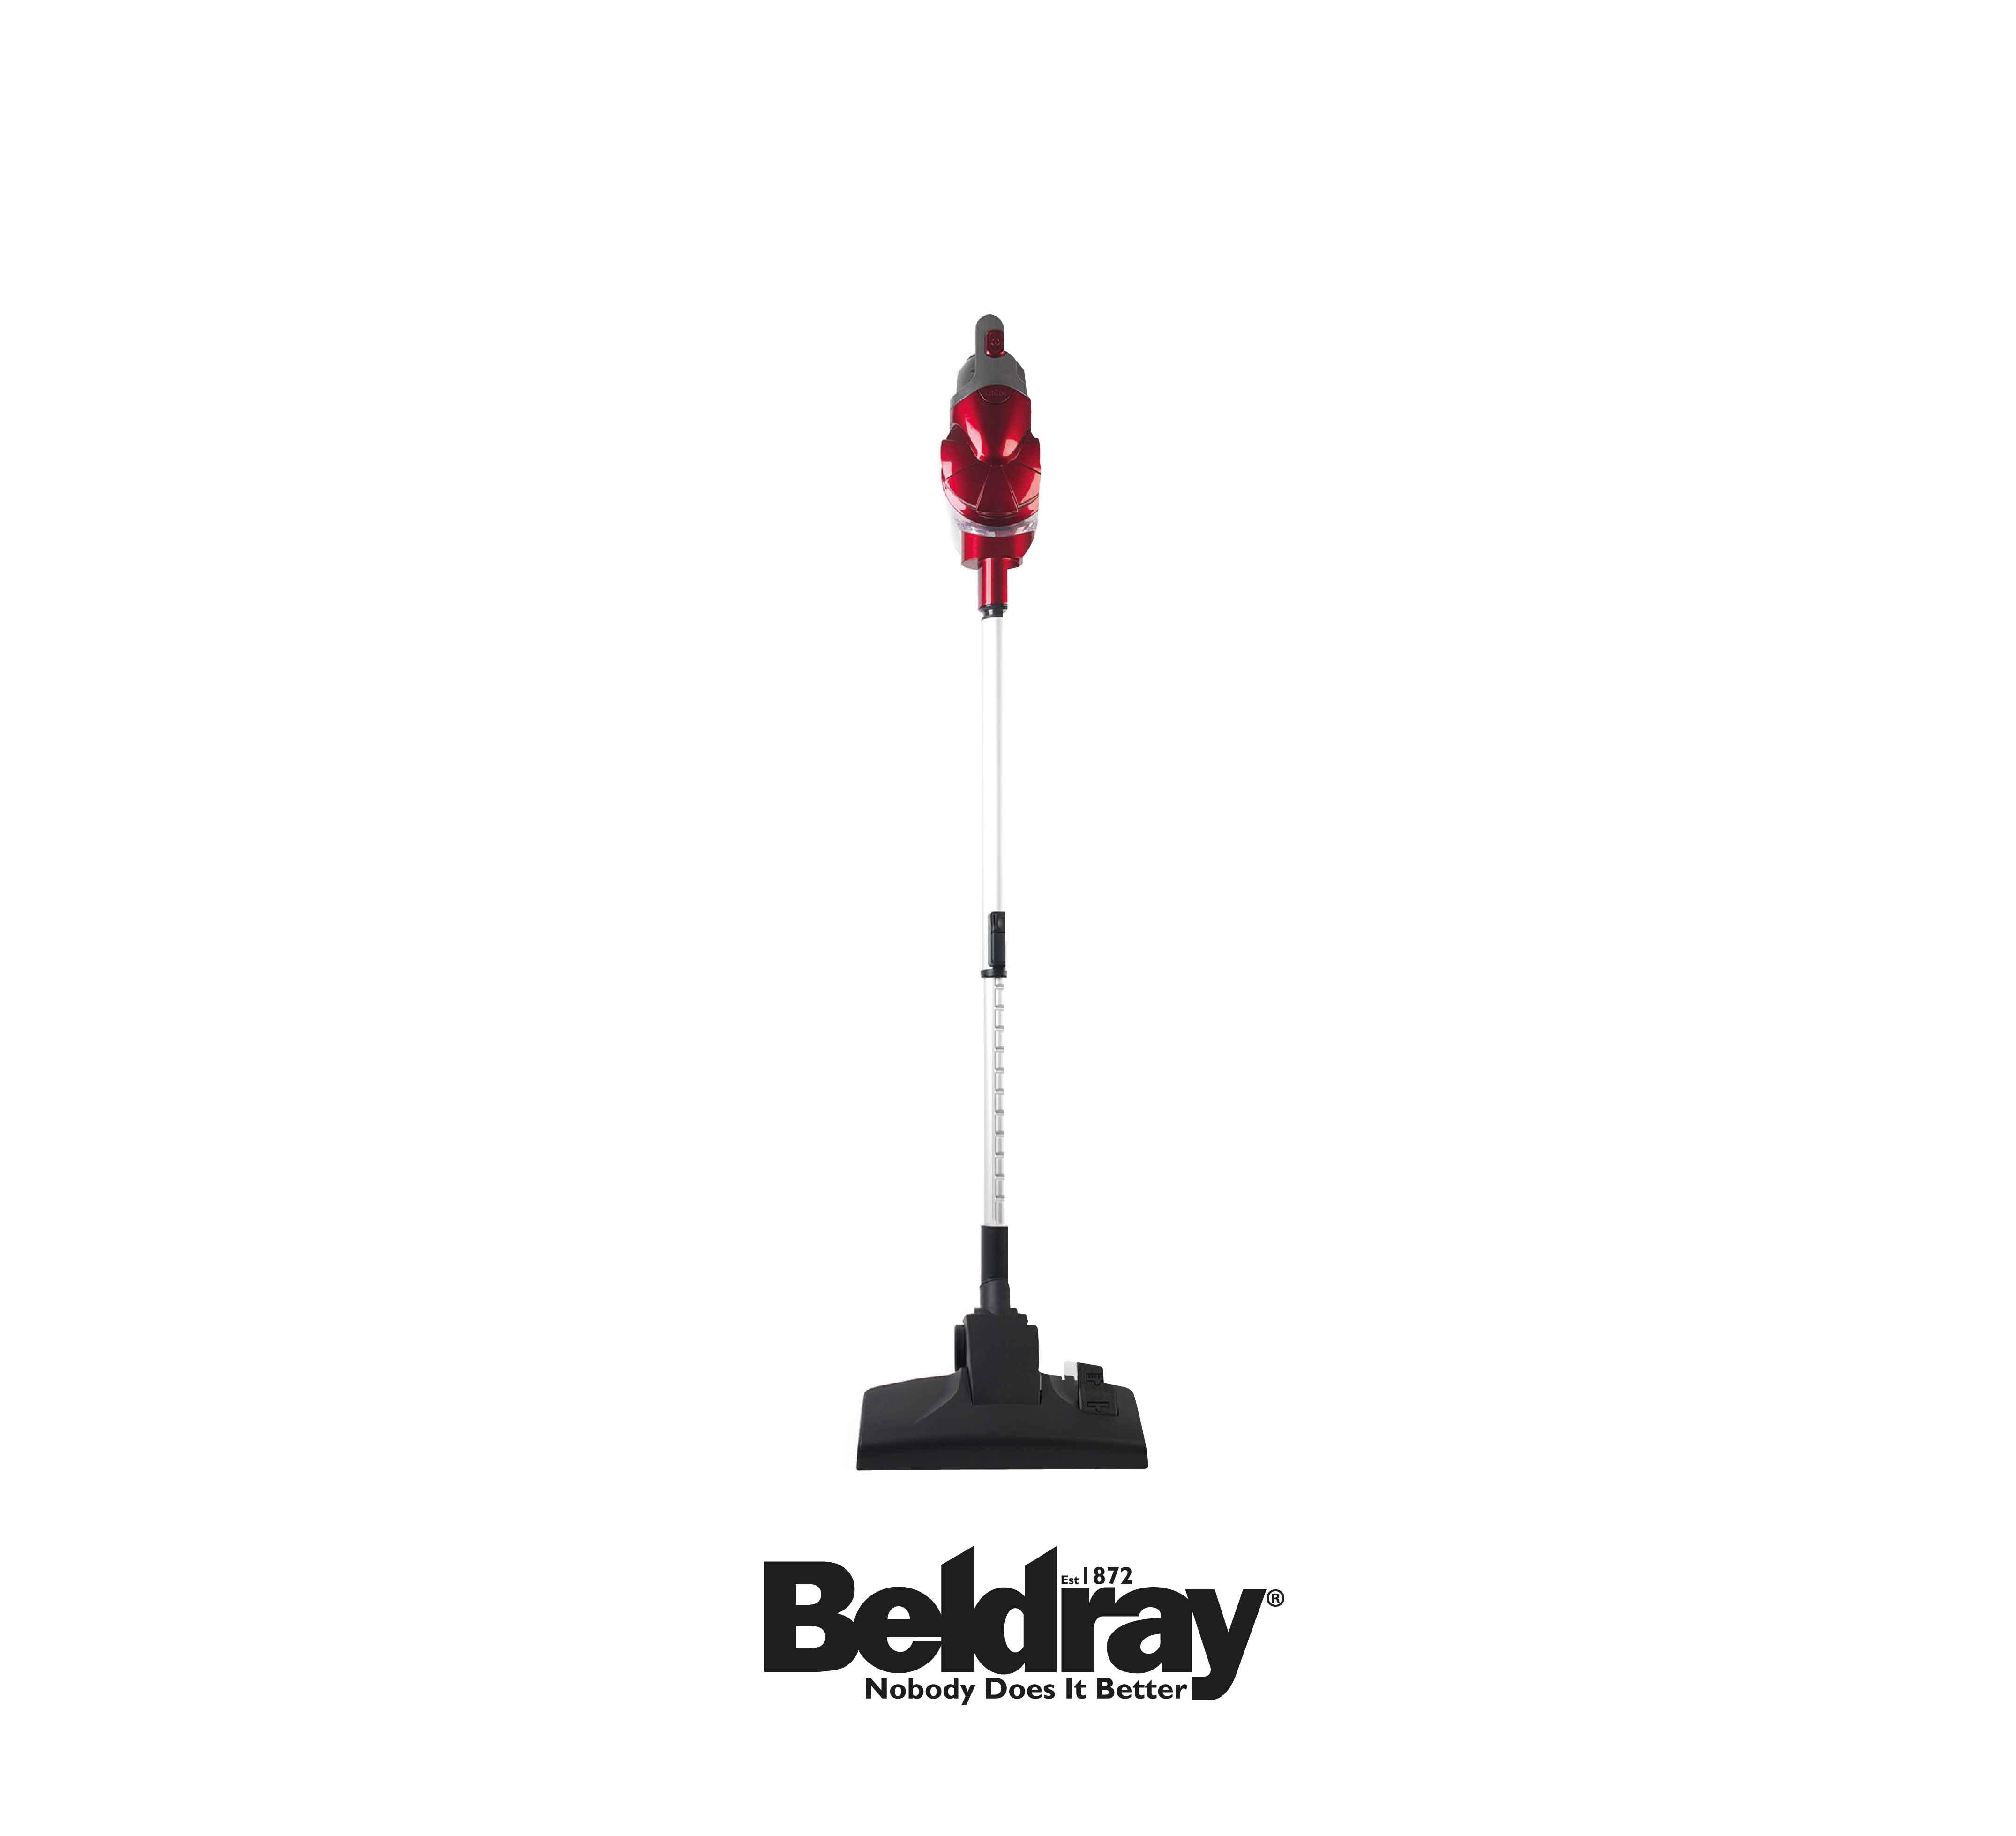 Beldraylite